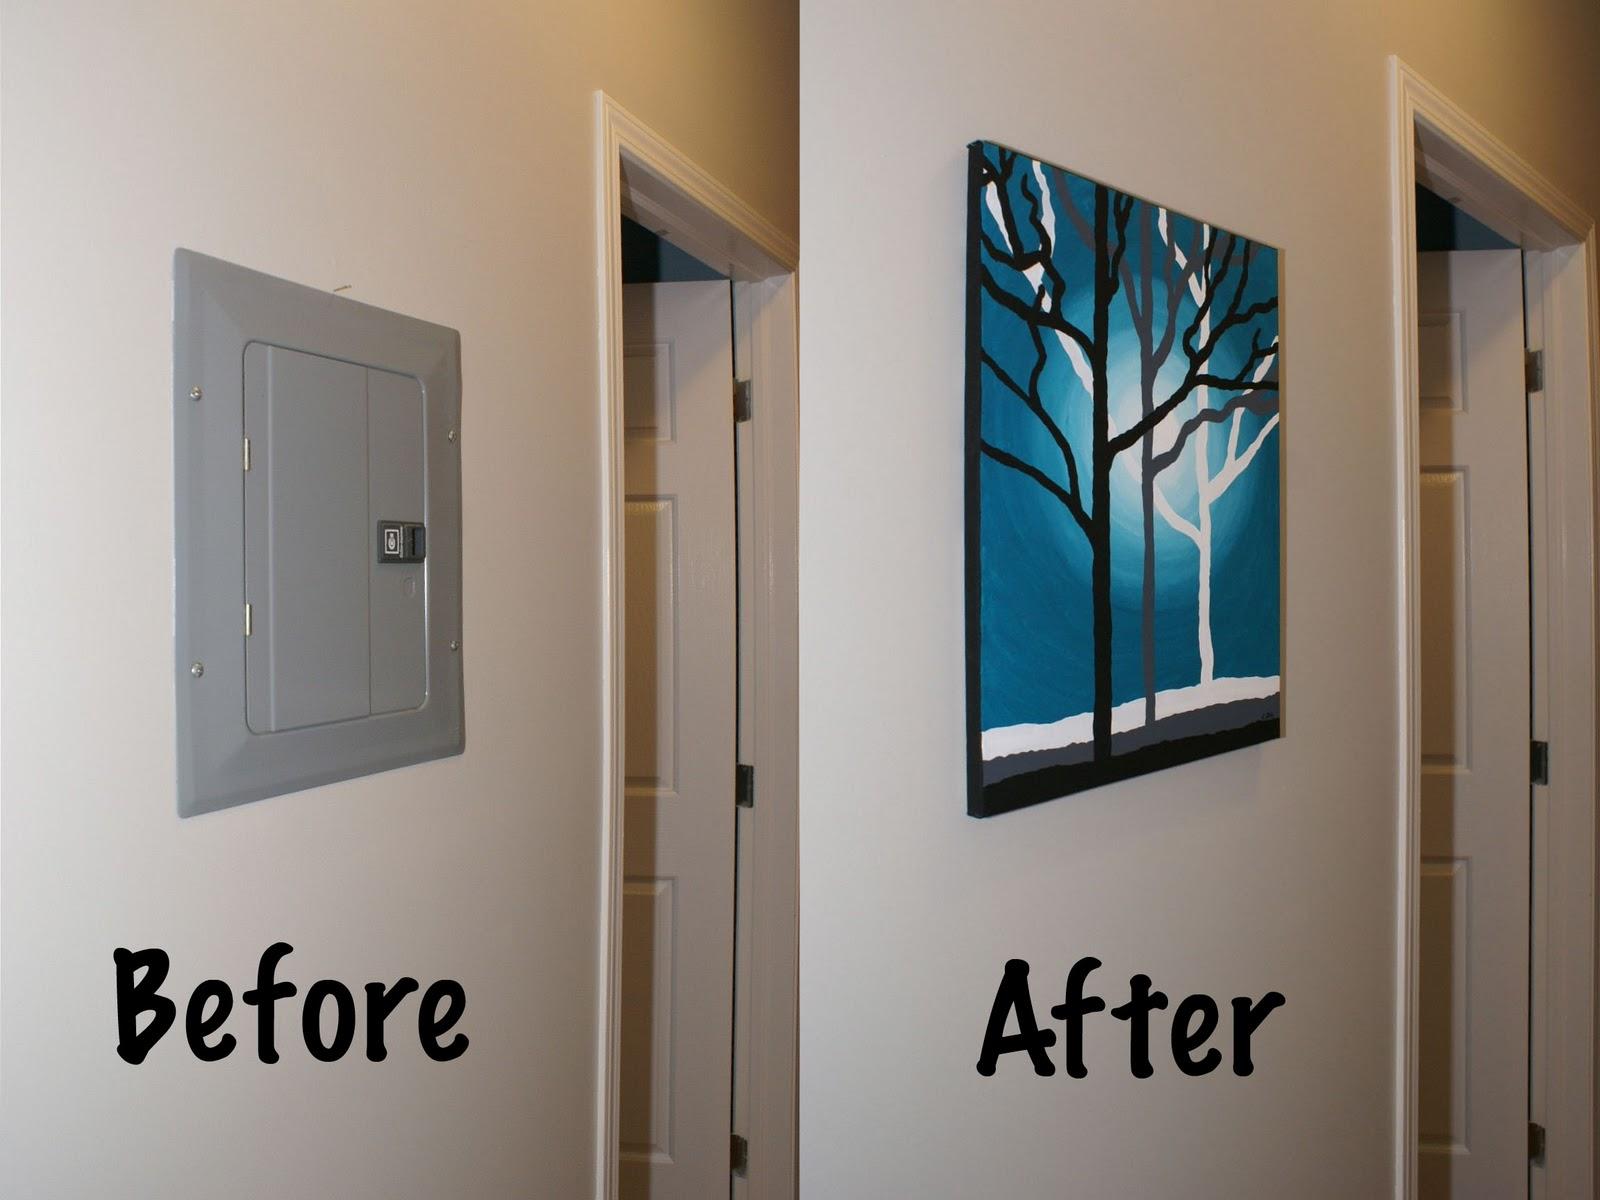 decorative electrical junction box covers decorative. Black Bedroom Furniture Sets. Home Design Ideas